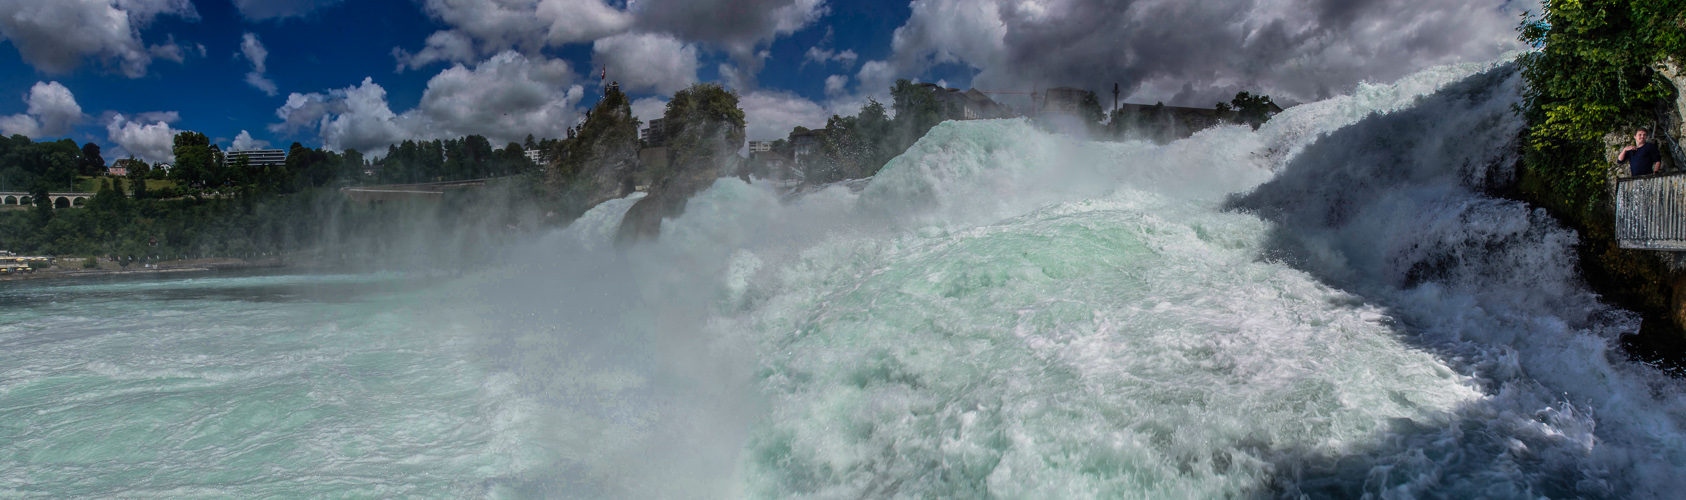 Rheinfall intensiv